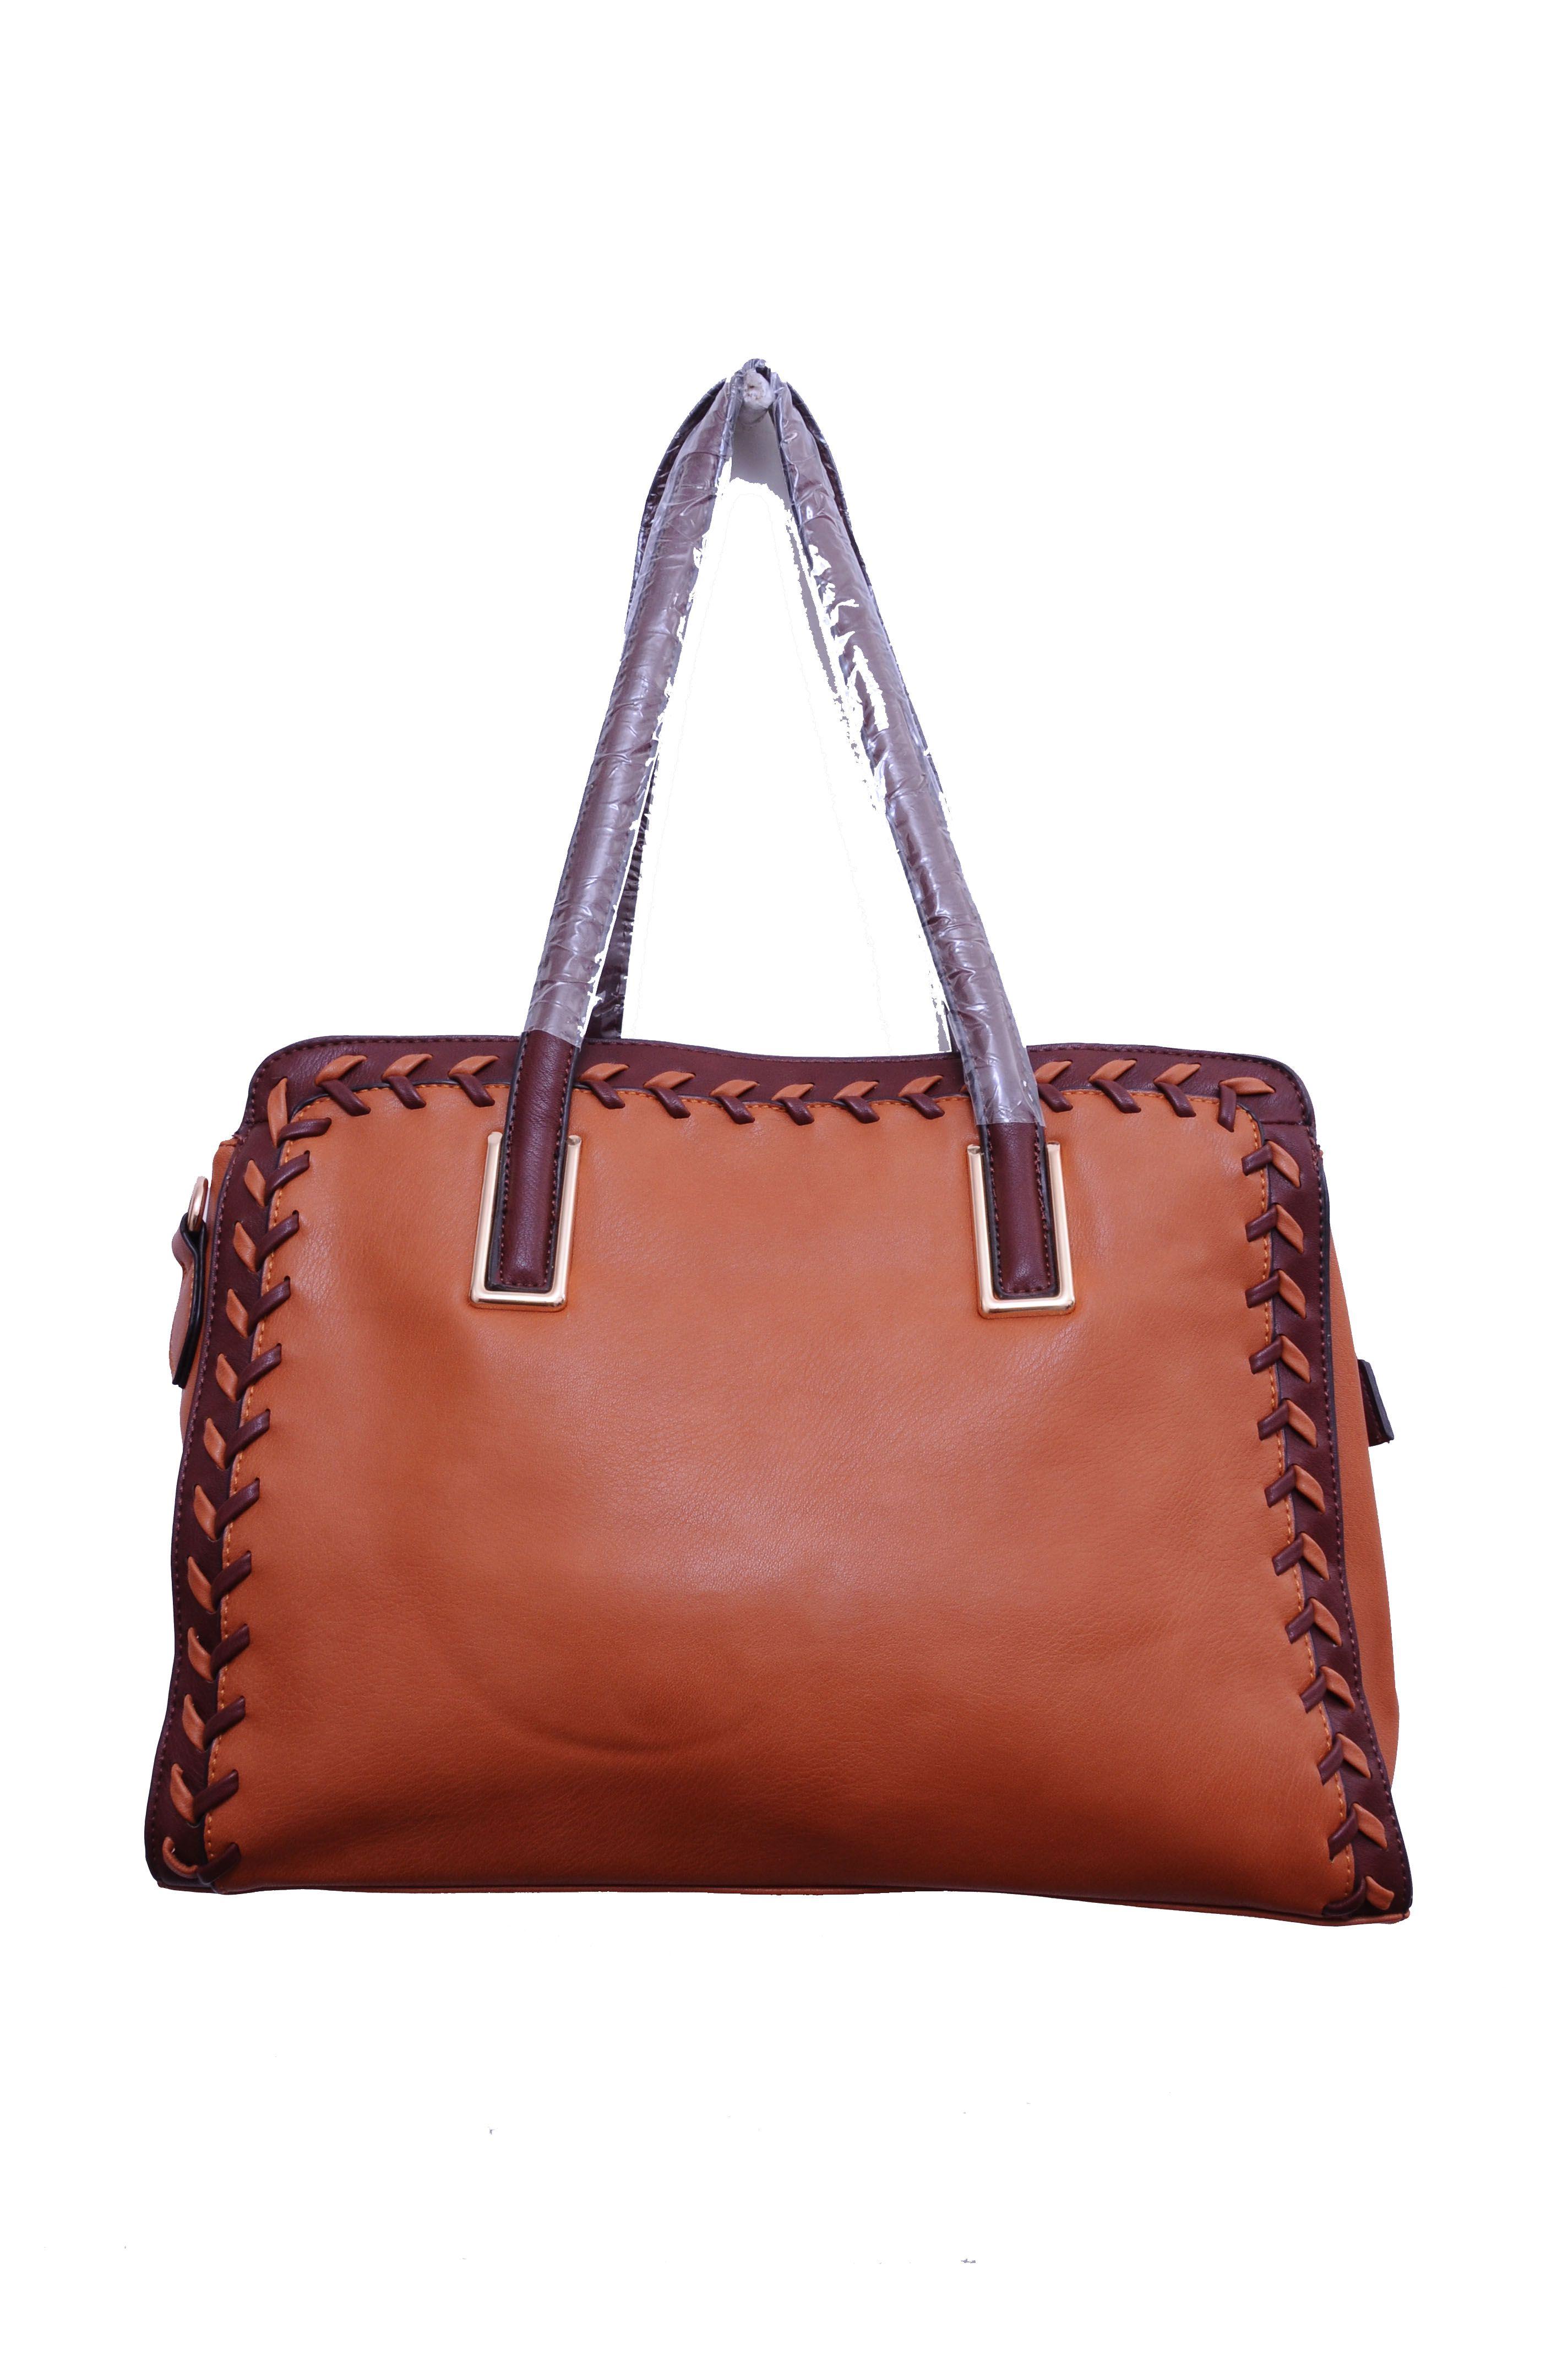 Monett Brown Faux Leather Shoulder Bag